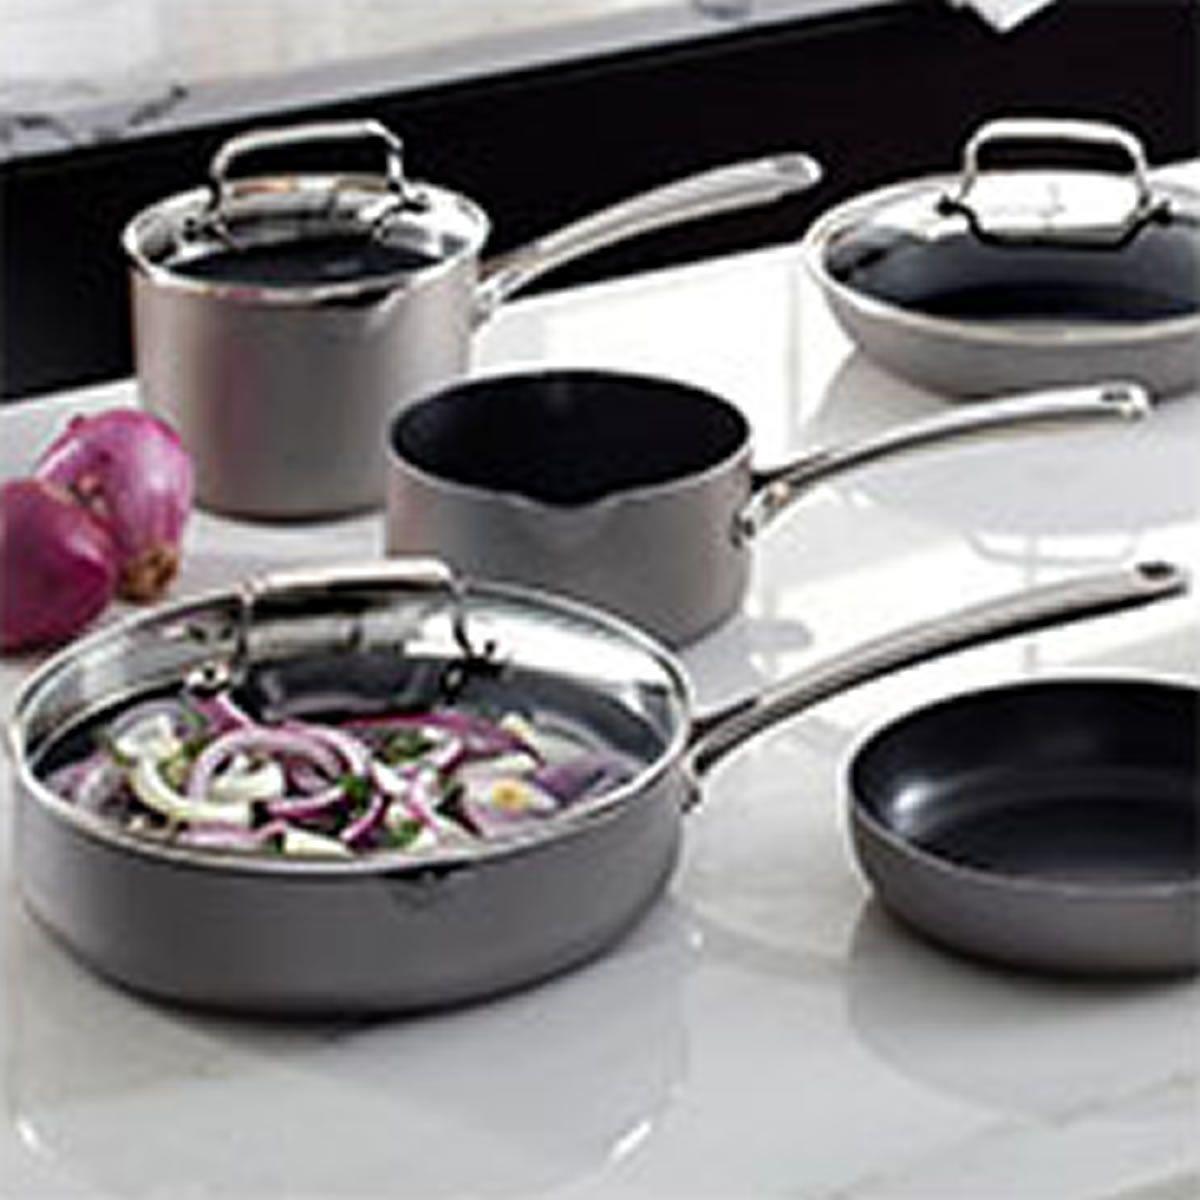 Cookware Kitchenaid Appliances Amp Accessories Macy S